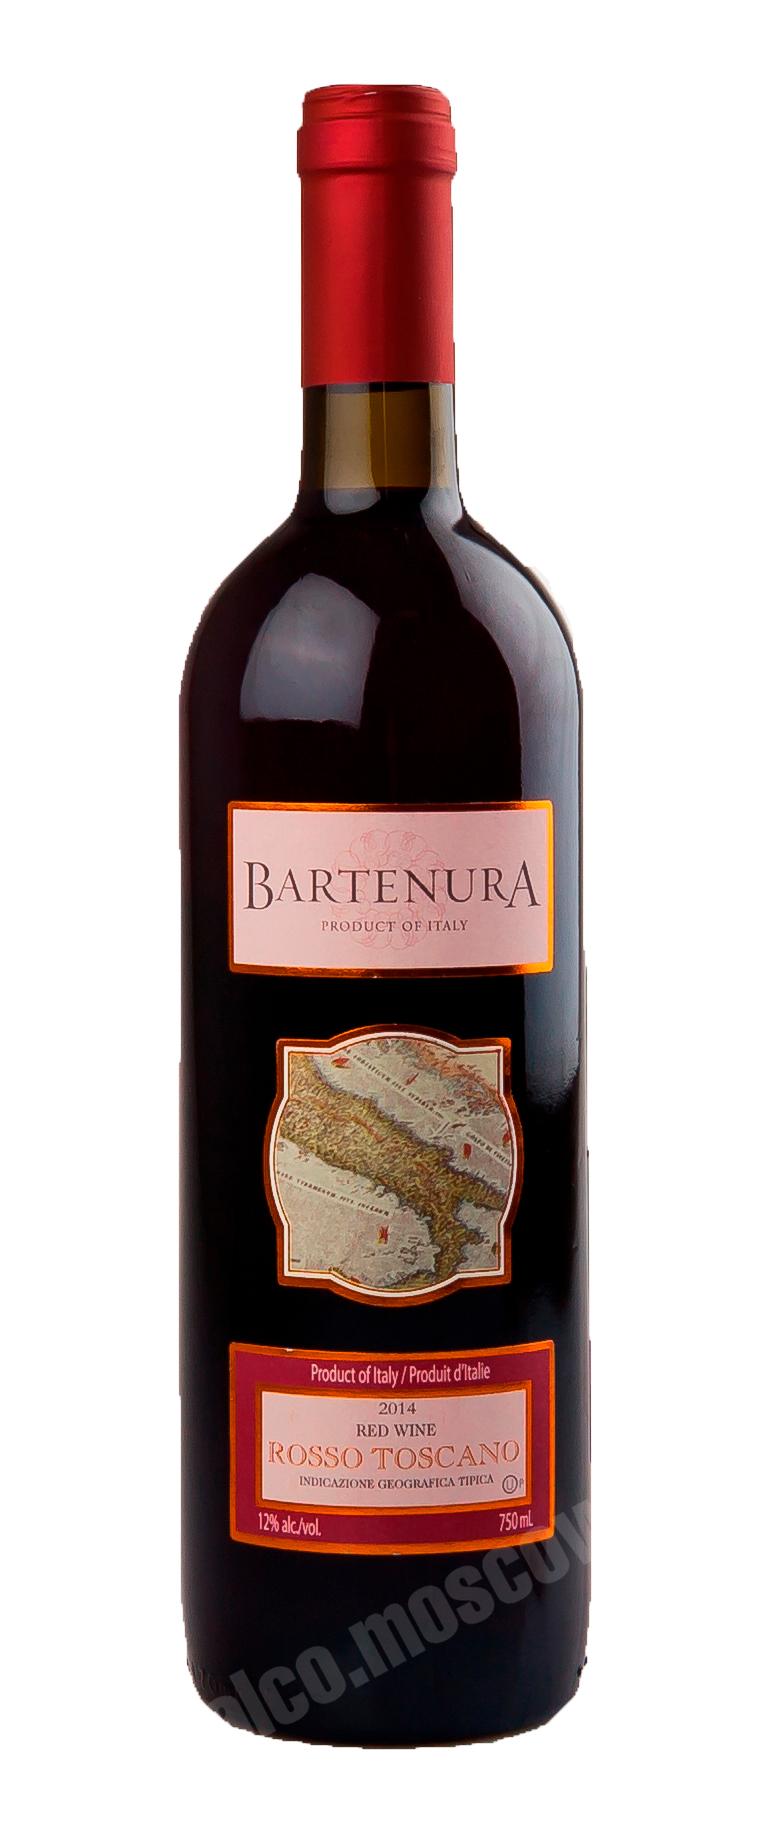 Bartenura Bartenura Rosso Toscano Вино Итальянское Бартенура Тоскана